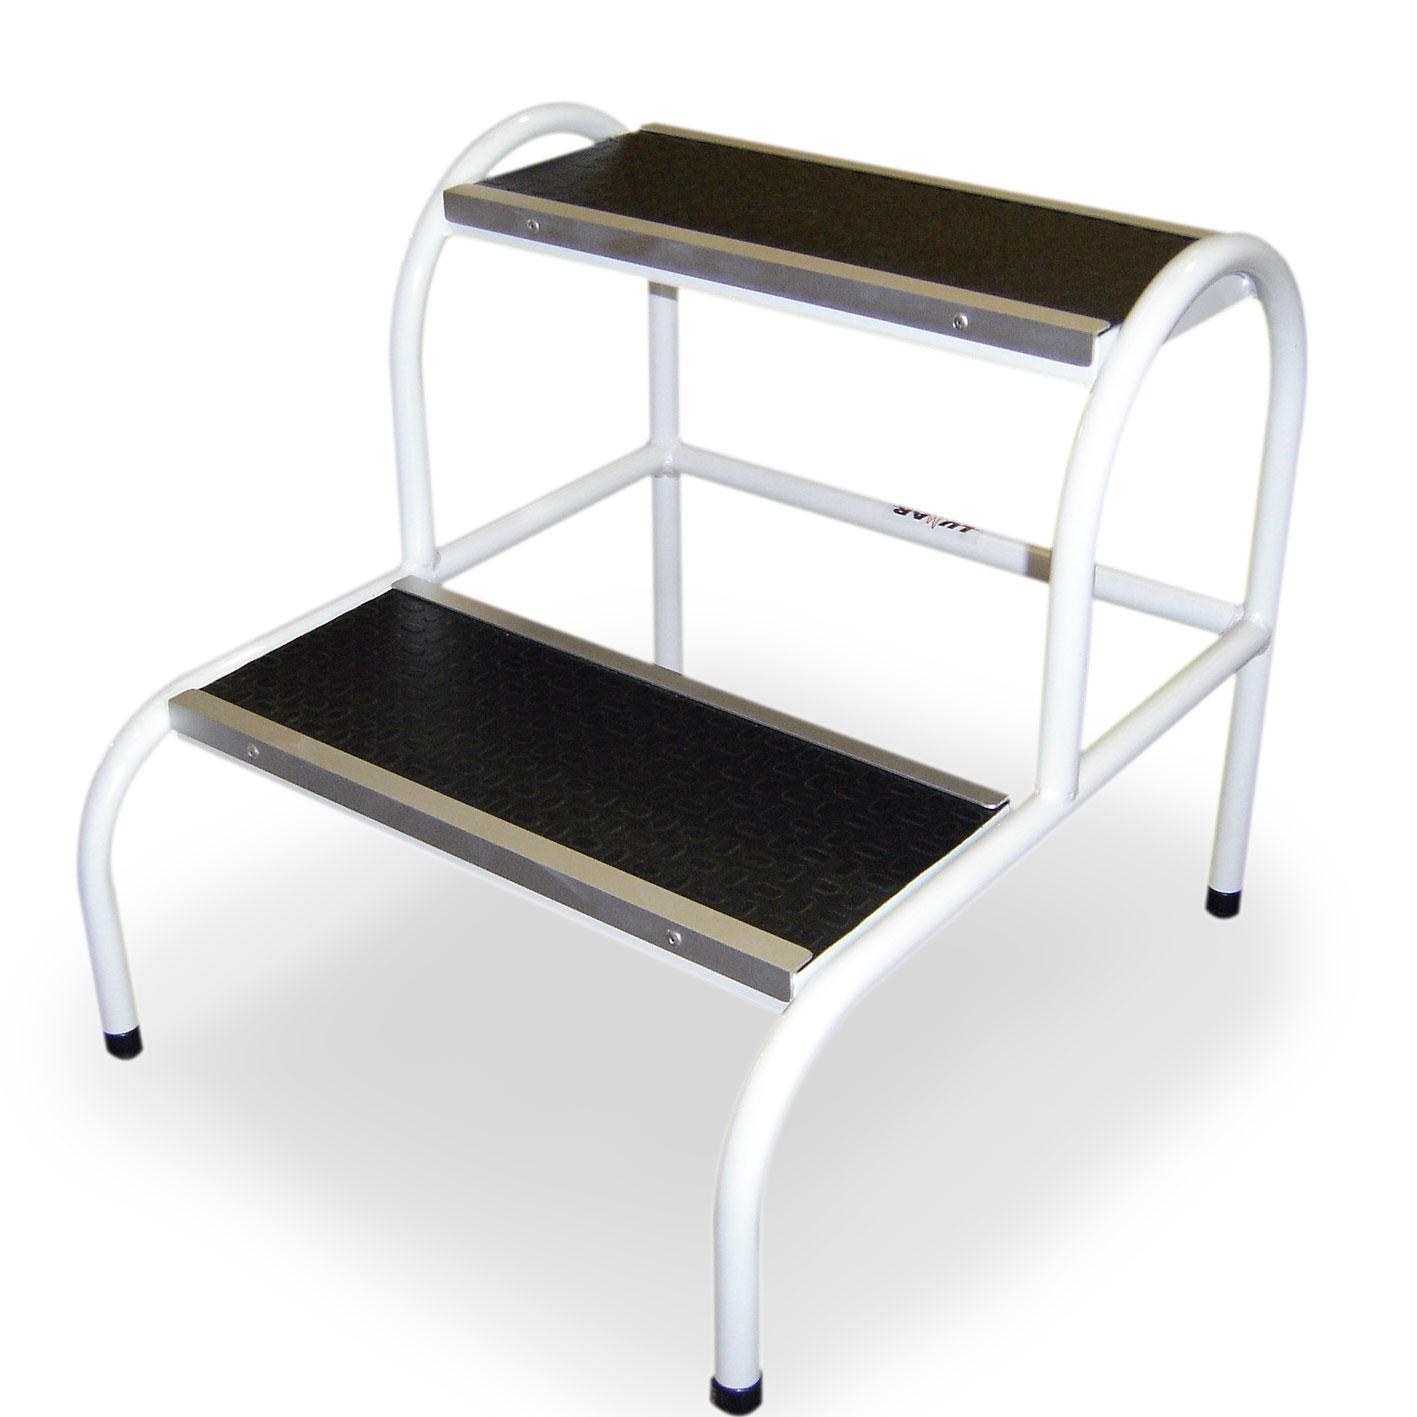 Kit Ginecológico Standart (mesa + escada + mocho)